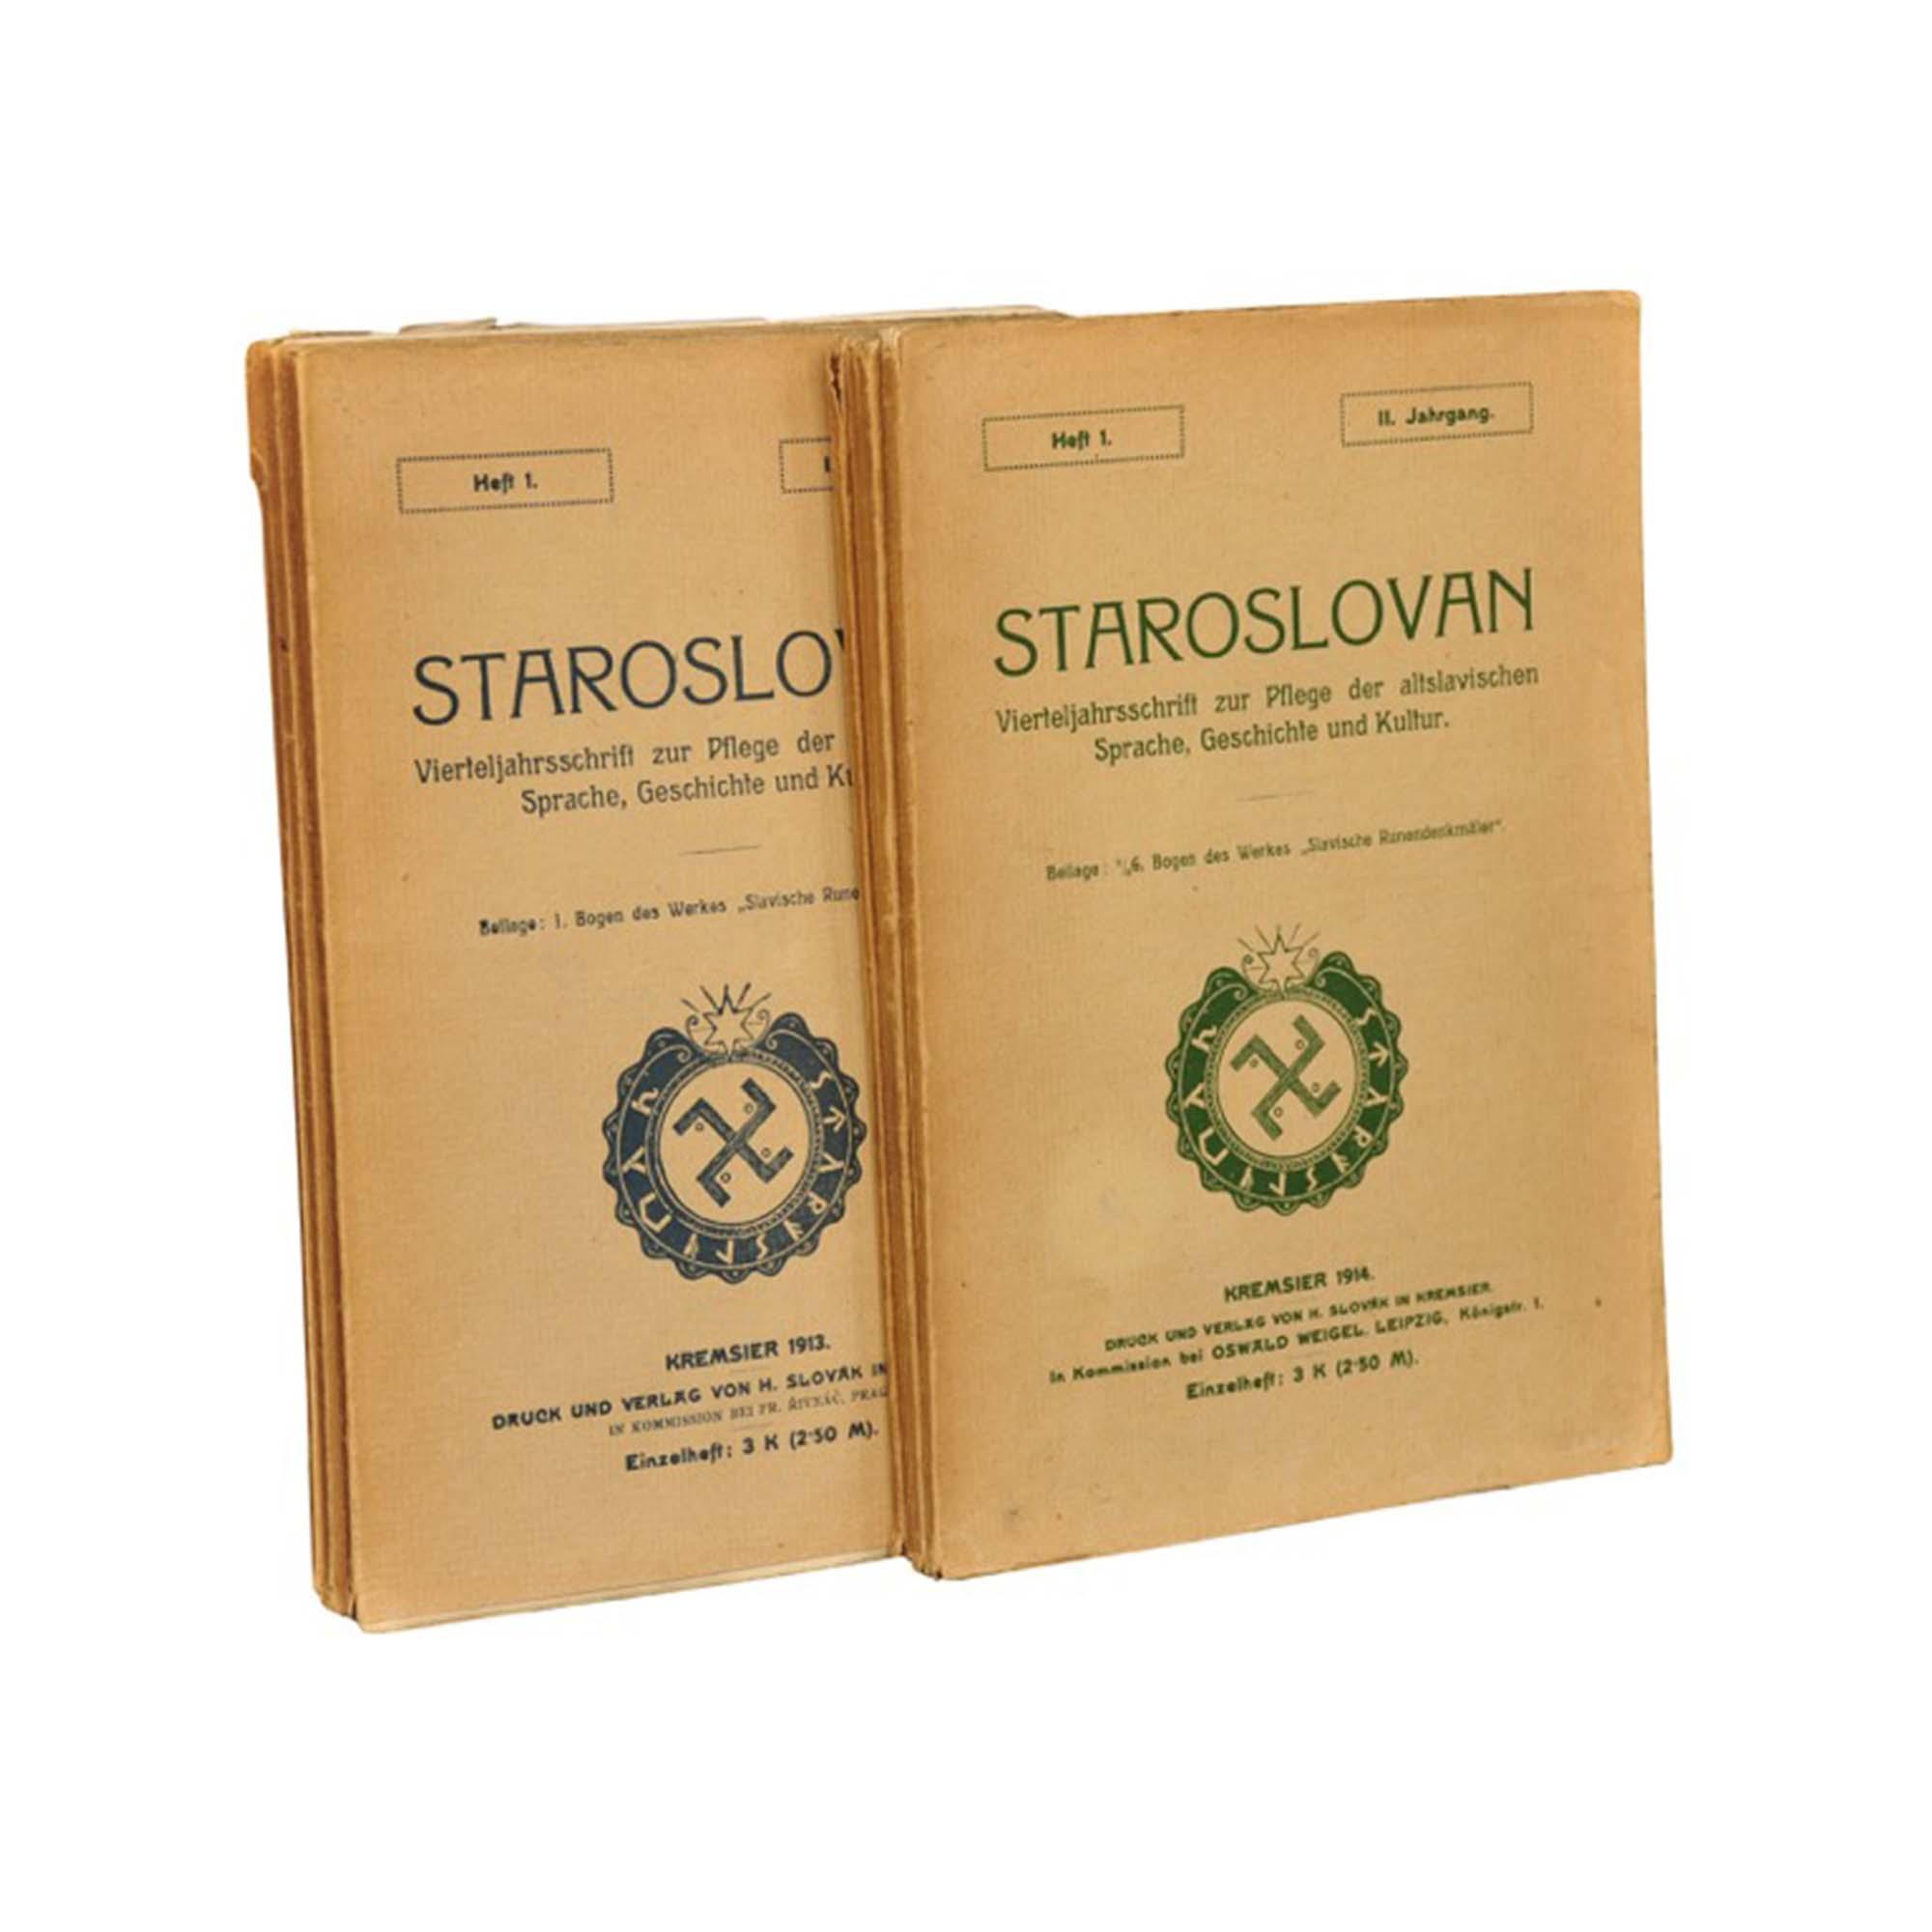 1197-Staroslovan-1913-1914-1-N.jpeg